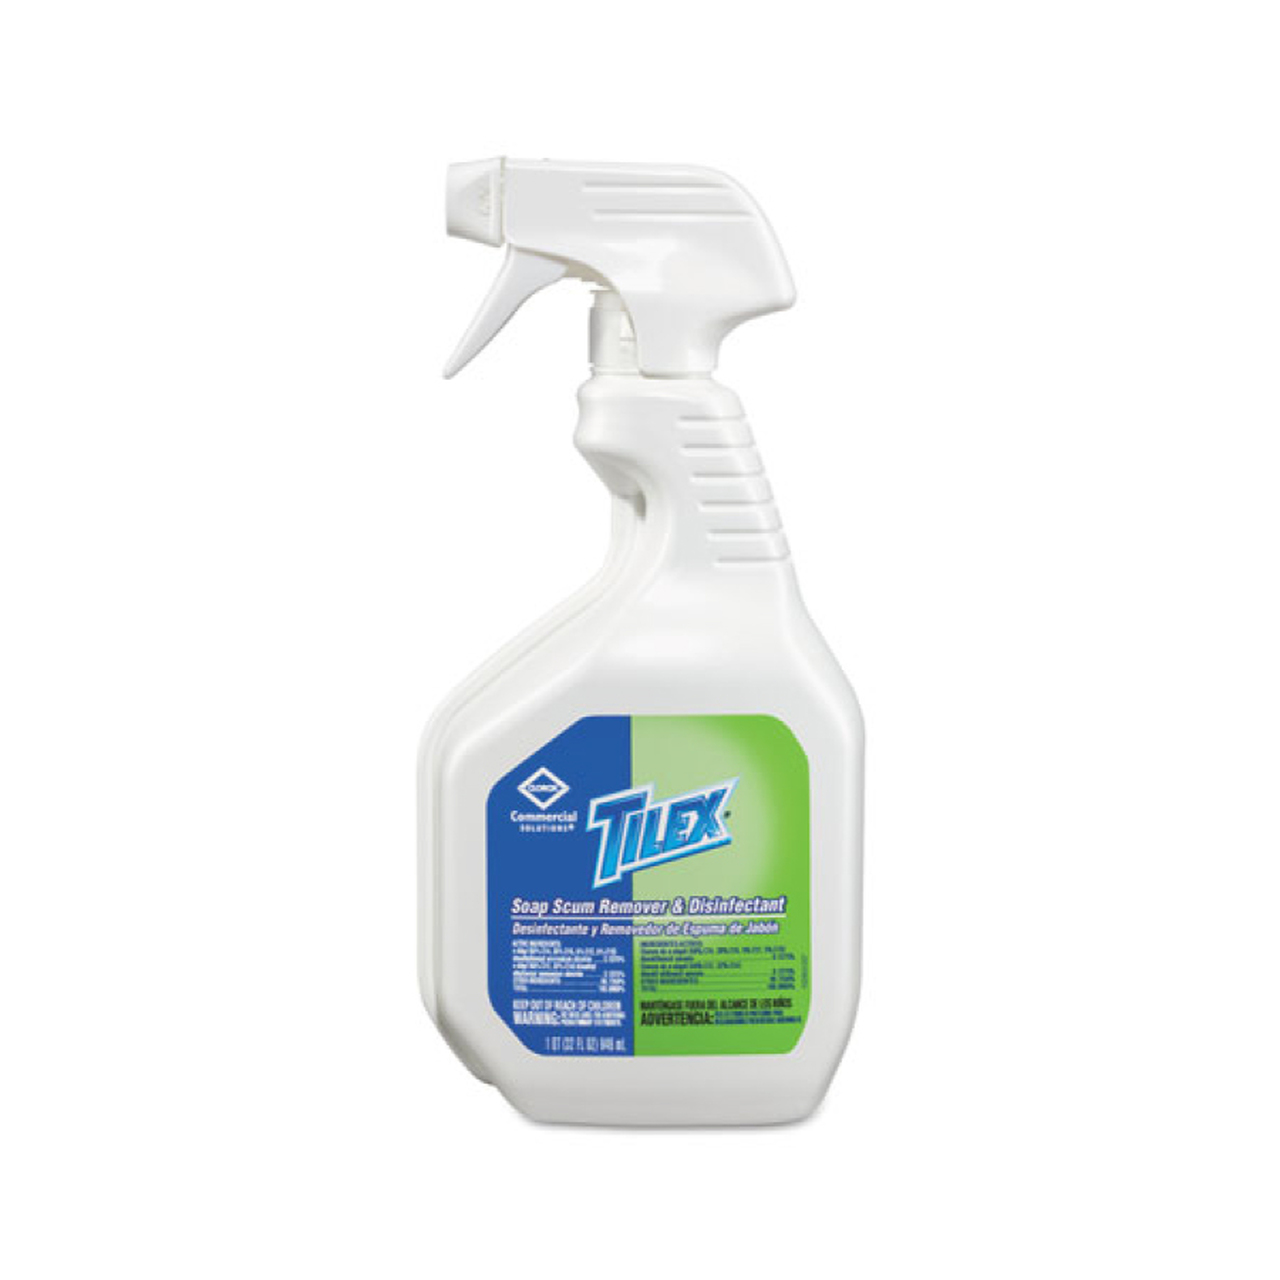 Tilex Soap Scum Remover And Disinfectant, 32 Oz Smart Tube Spray (9/case)